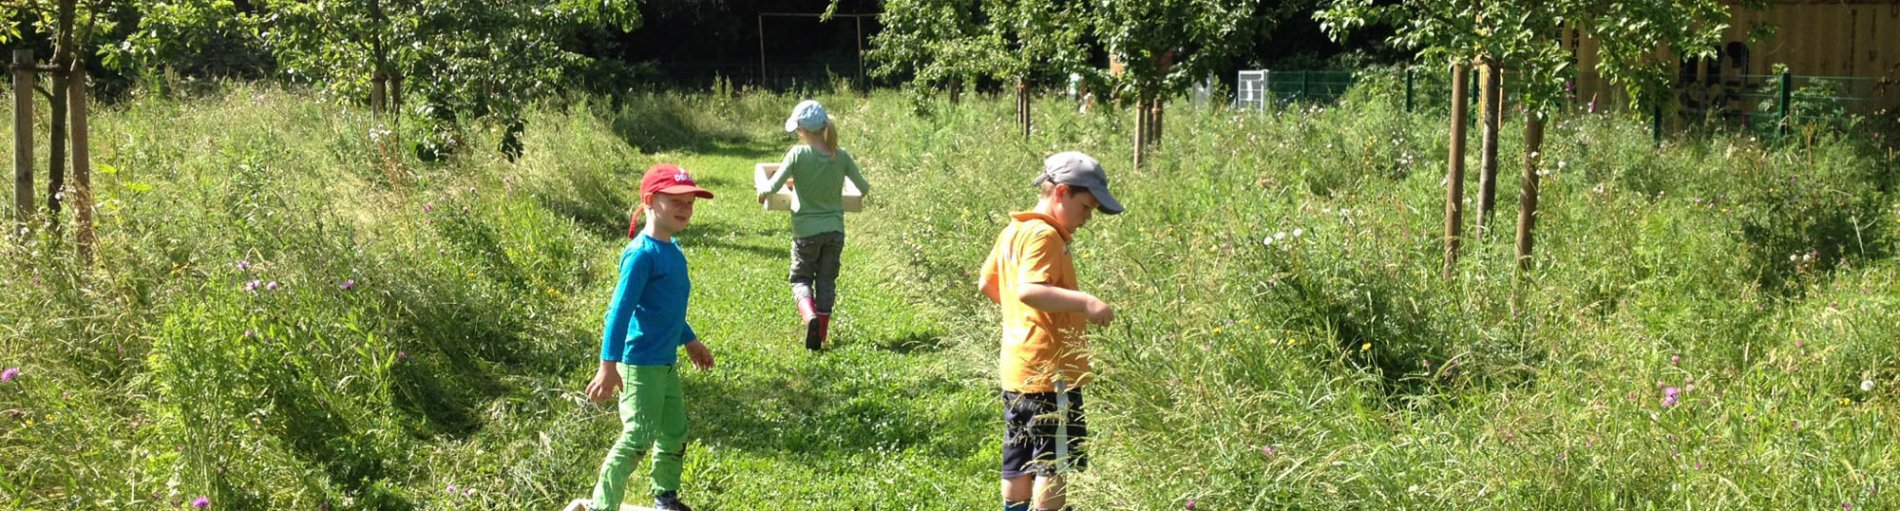 Spielende Kinder im ApfelKULTURparadies.